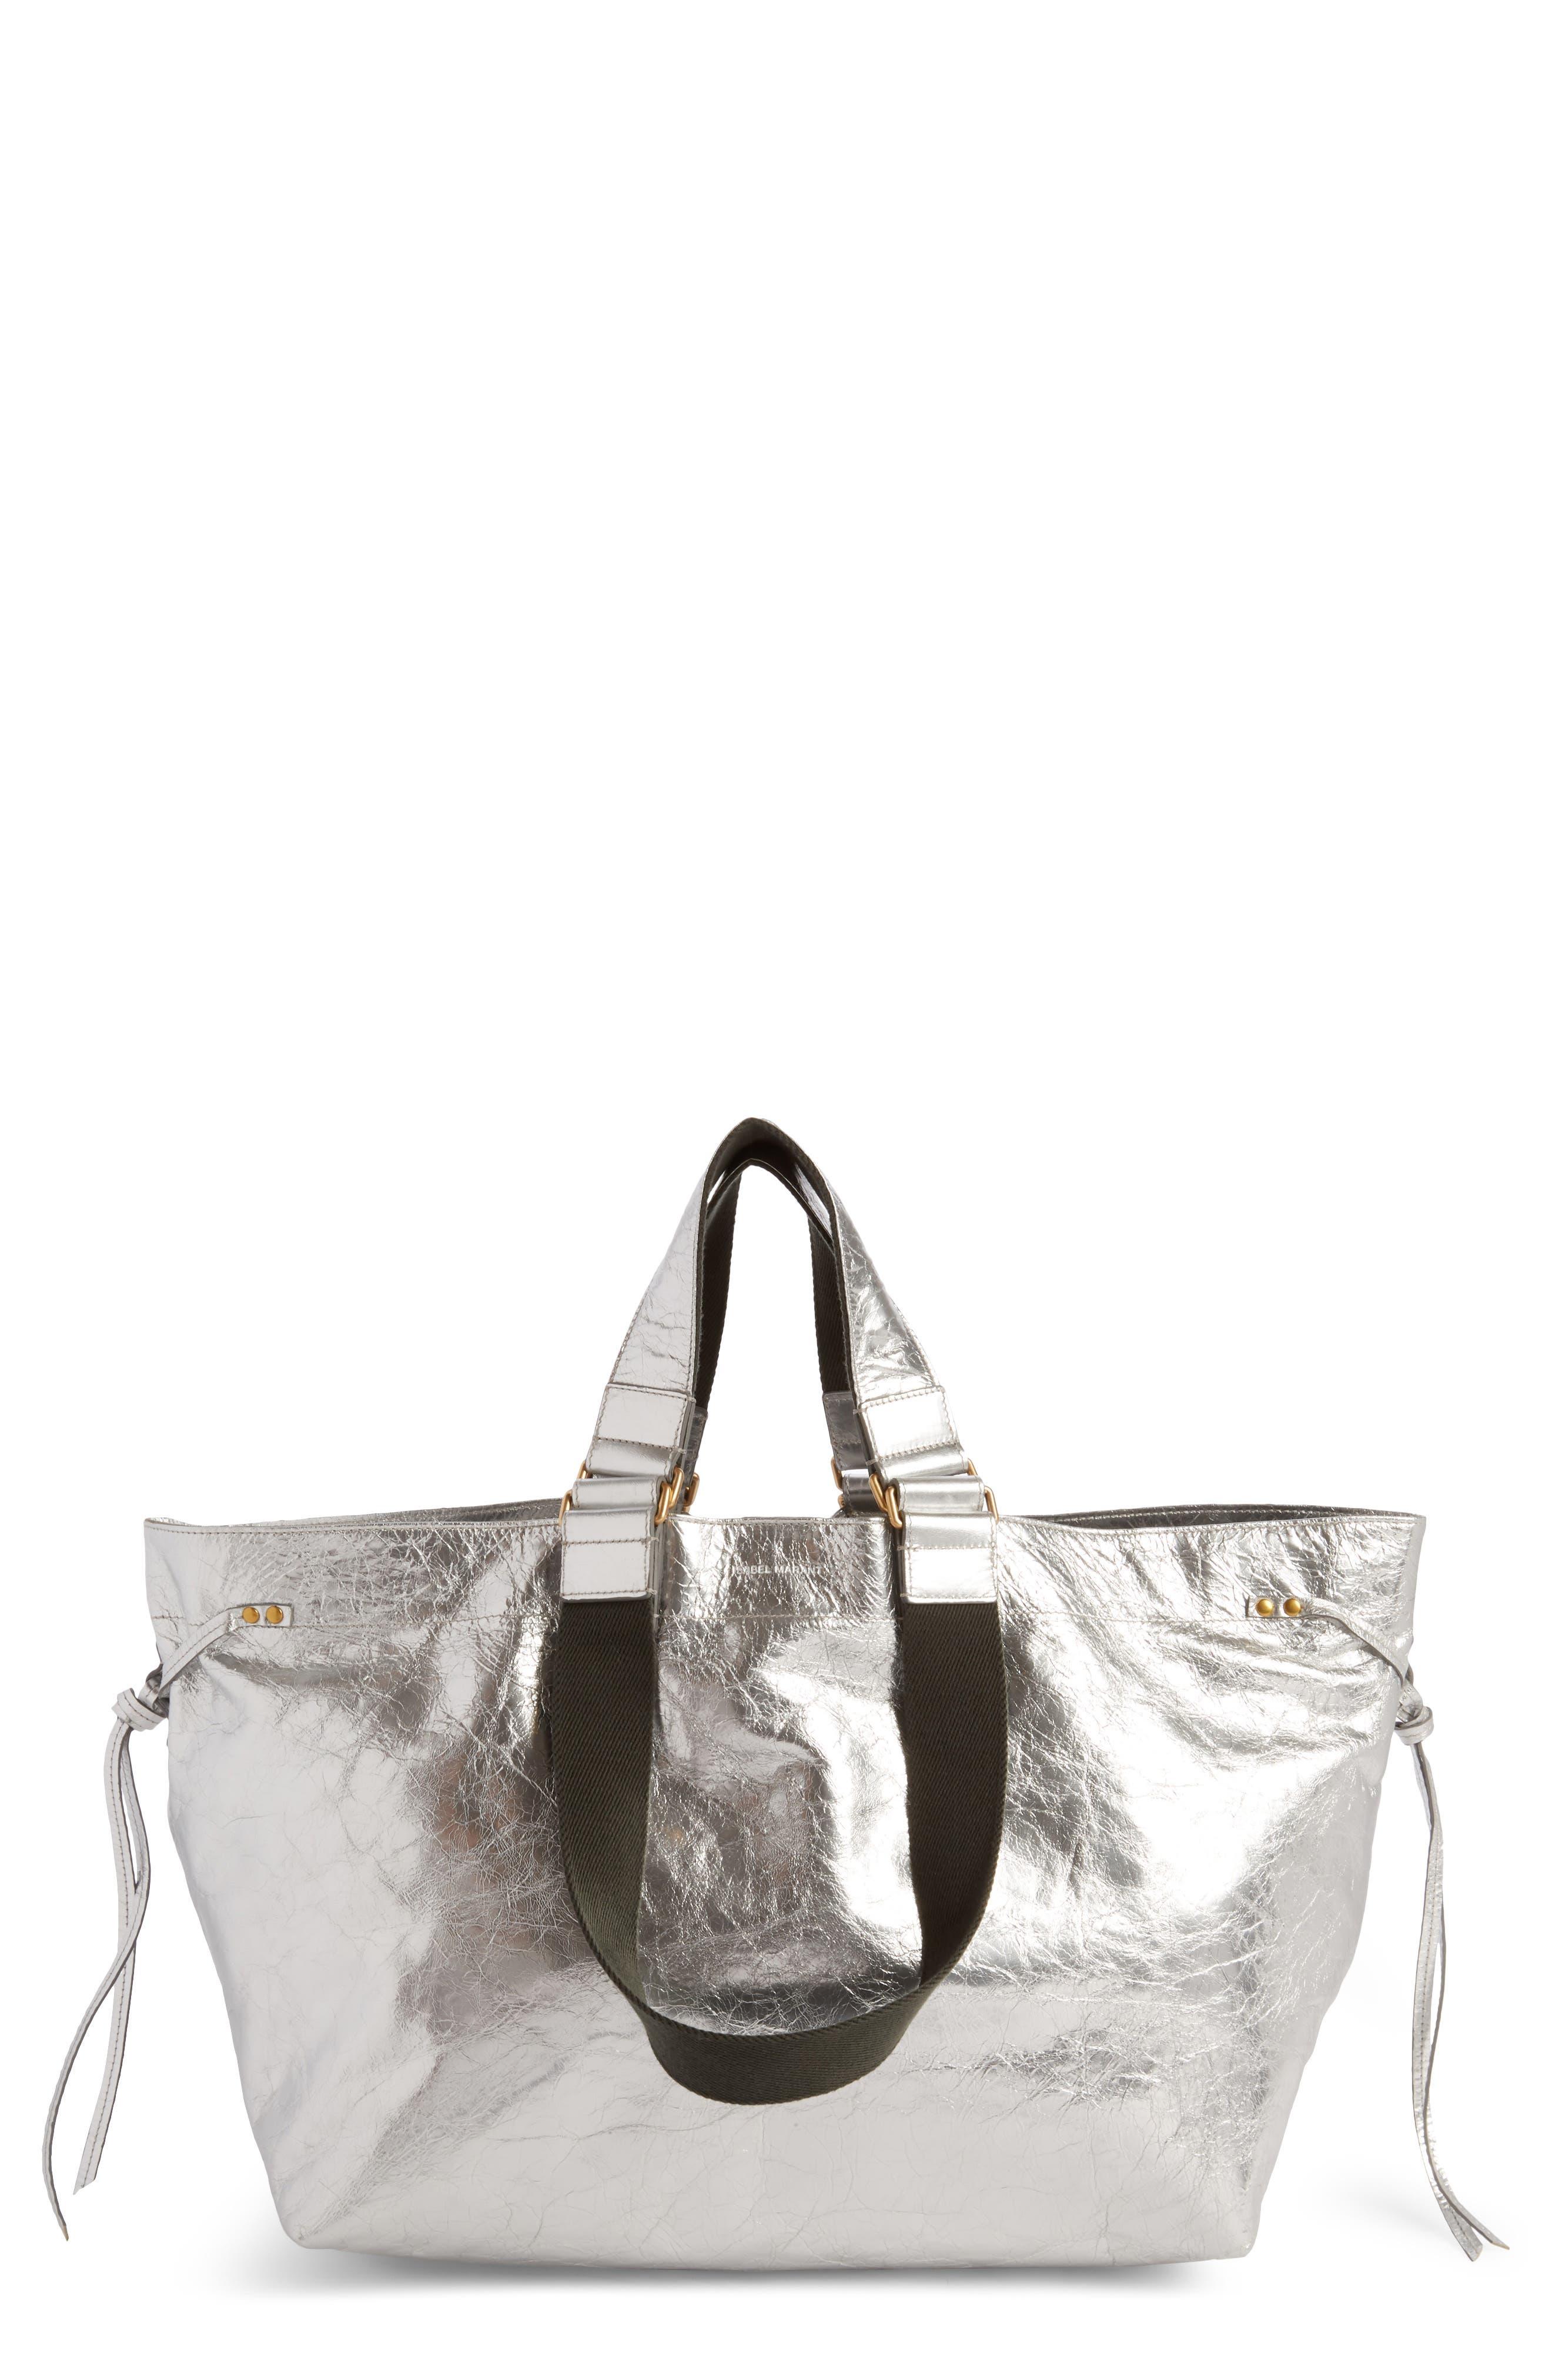 Wardy Metallic Leather Shopper,                             Main thumbnail 1, color,                             Silver